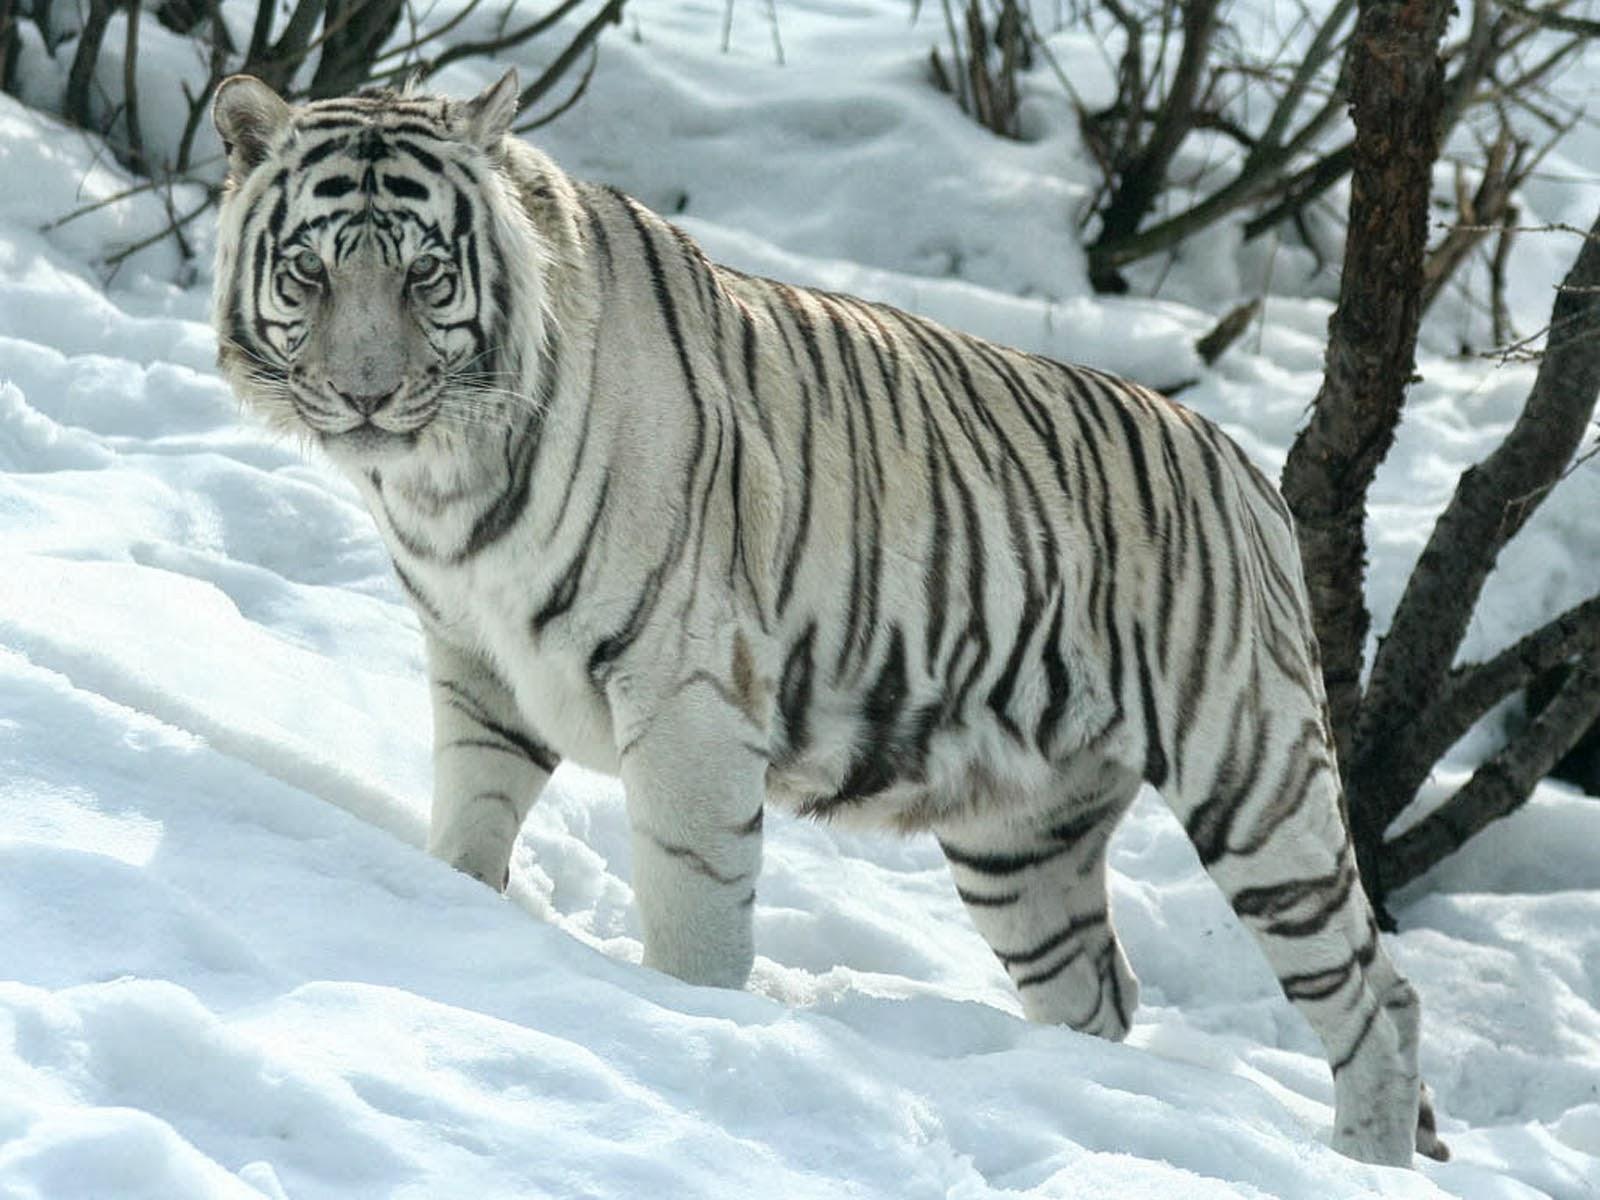 white tiger wallpapers white tiger desktop wallpapers white tiger 1600x1200